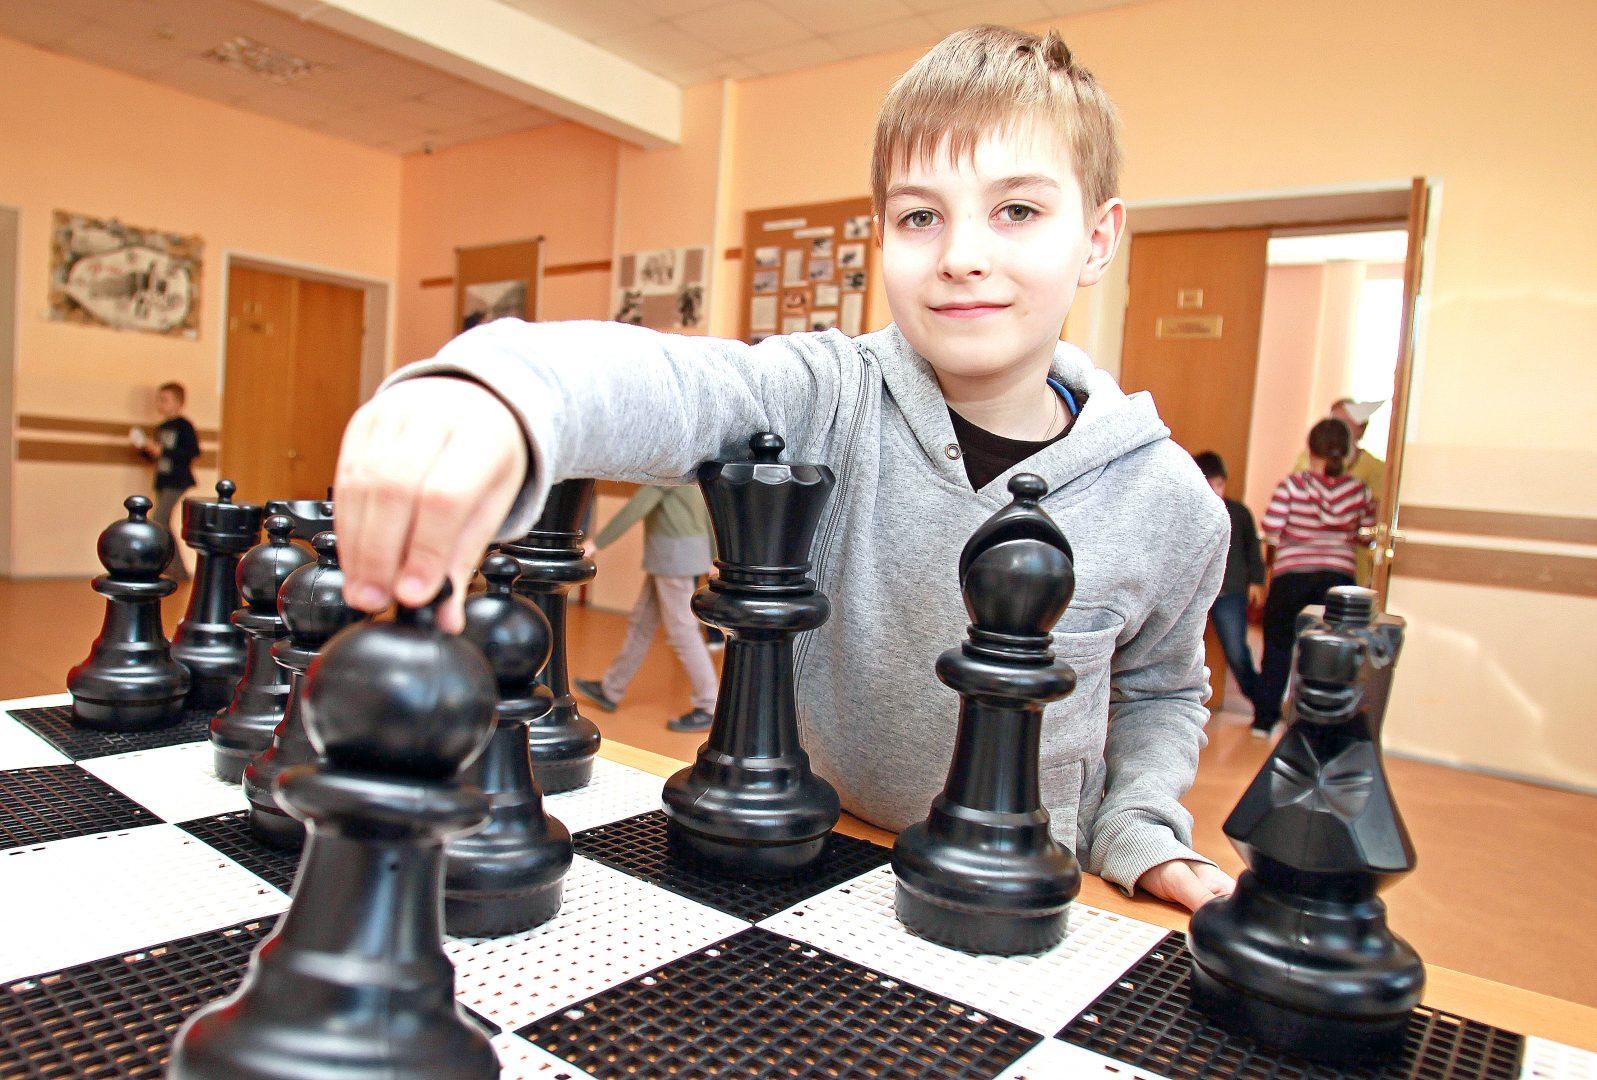 Шахматисты поселения Кленовское примут участие в турнире. Фото: Наталия Нечаева, «Вечерняя Москва»